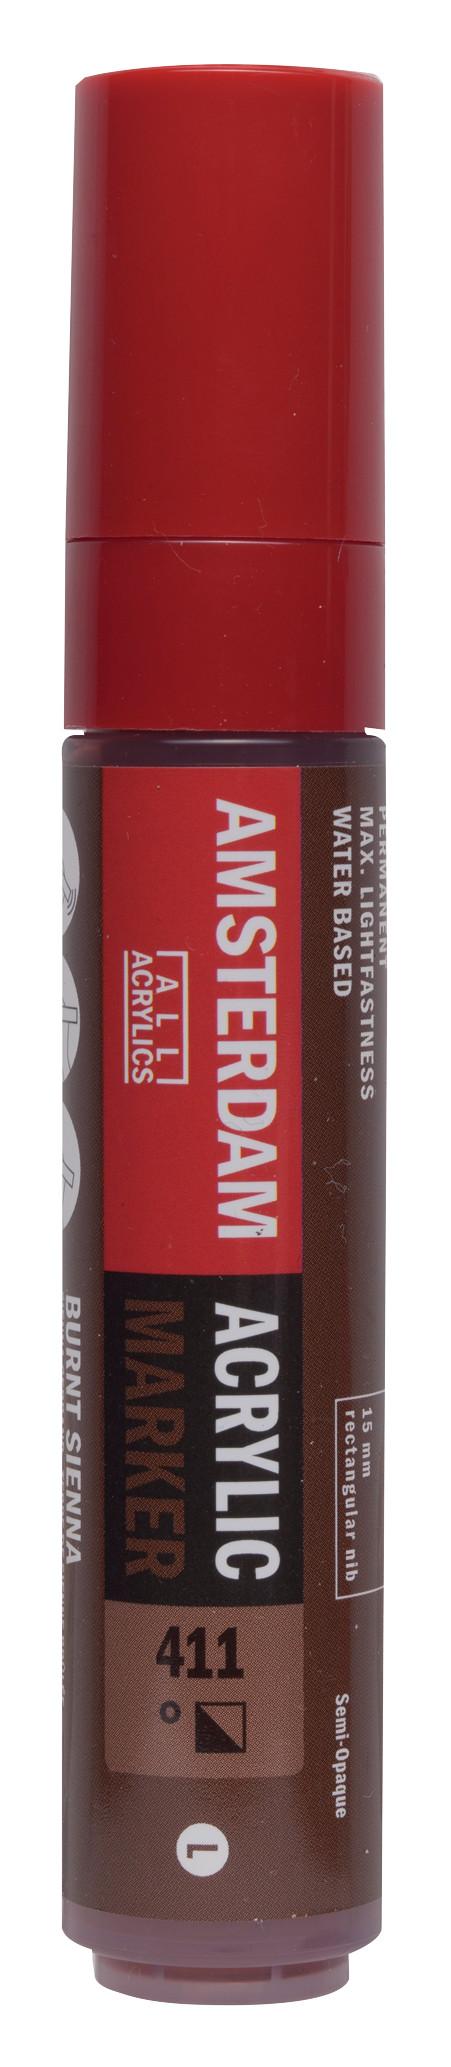 Amsterdam Acrylic Marker 15 mm Burnt Sienna 411